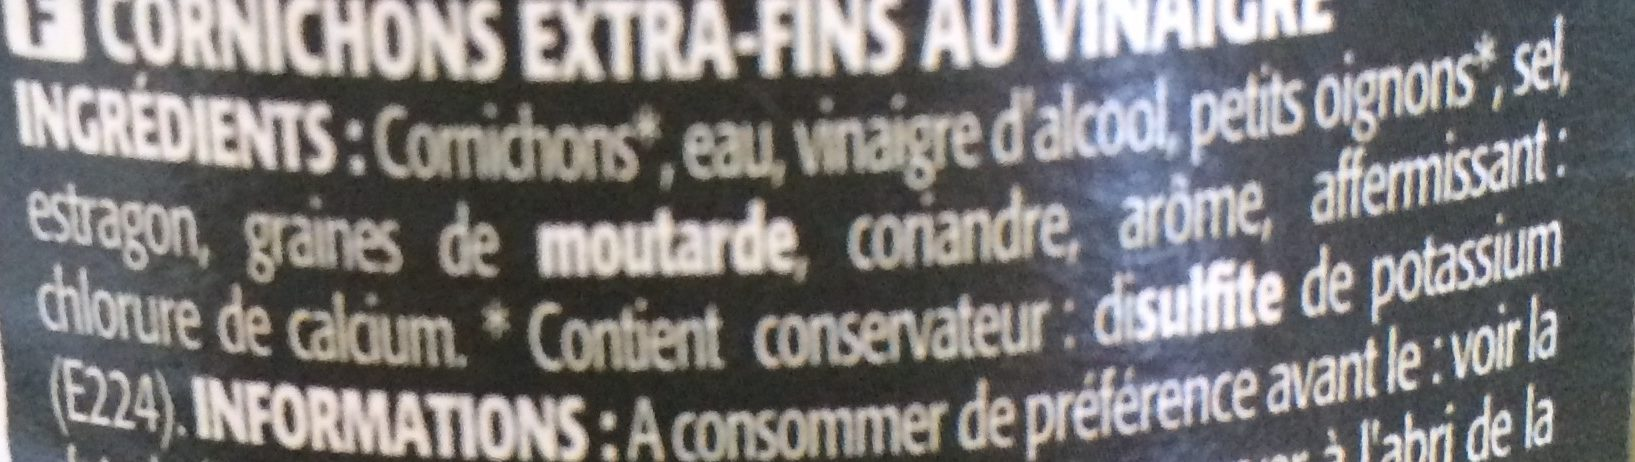 Cornichons extra-fins - Ingrediënten